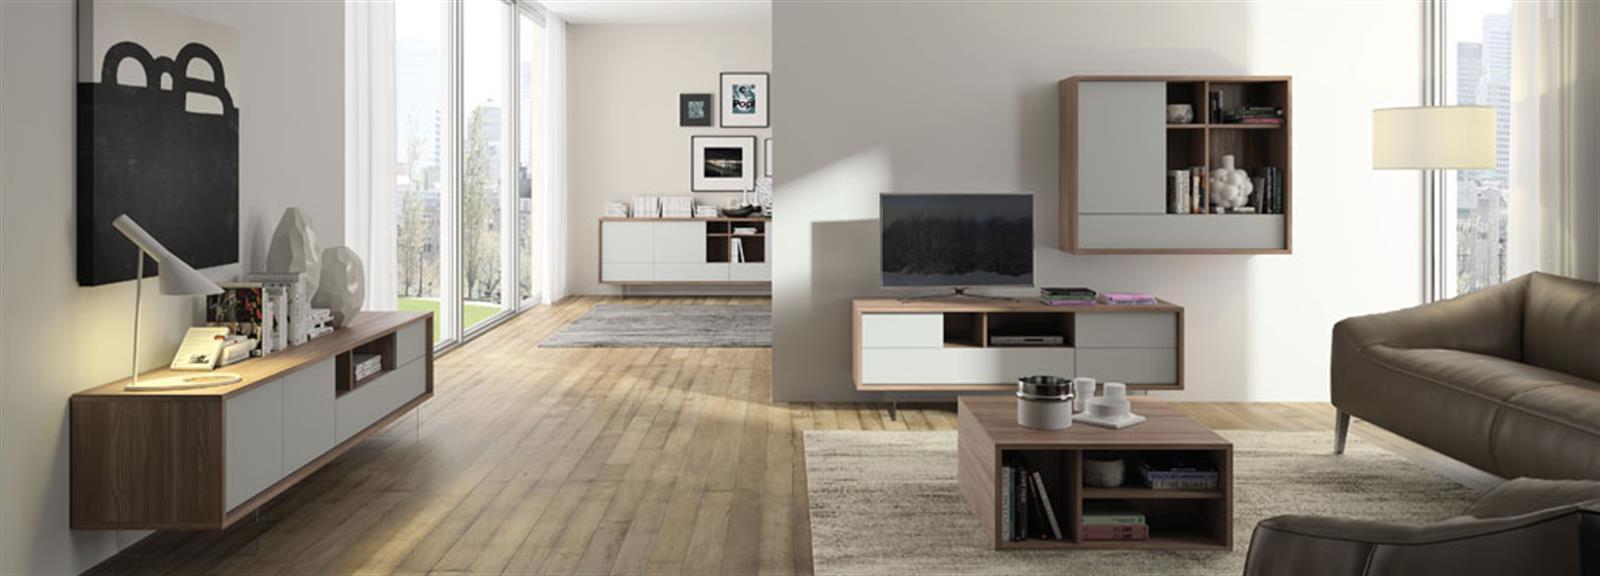 conforama petit lectrom nager cave vin editus. Black Bedroom Furniture Sets. Home Design Ideas